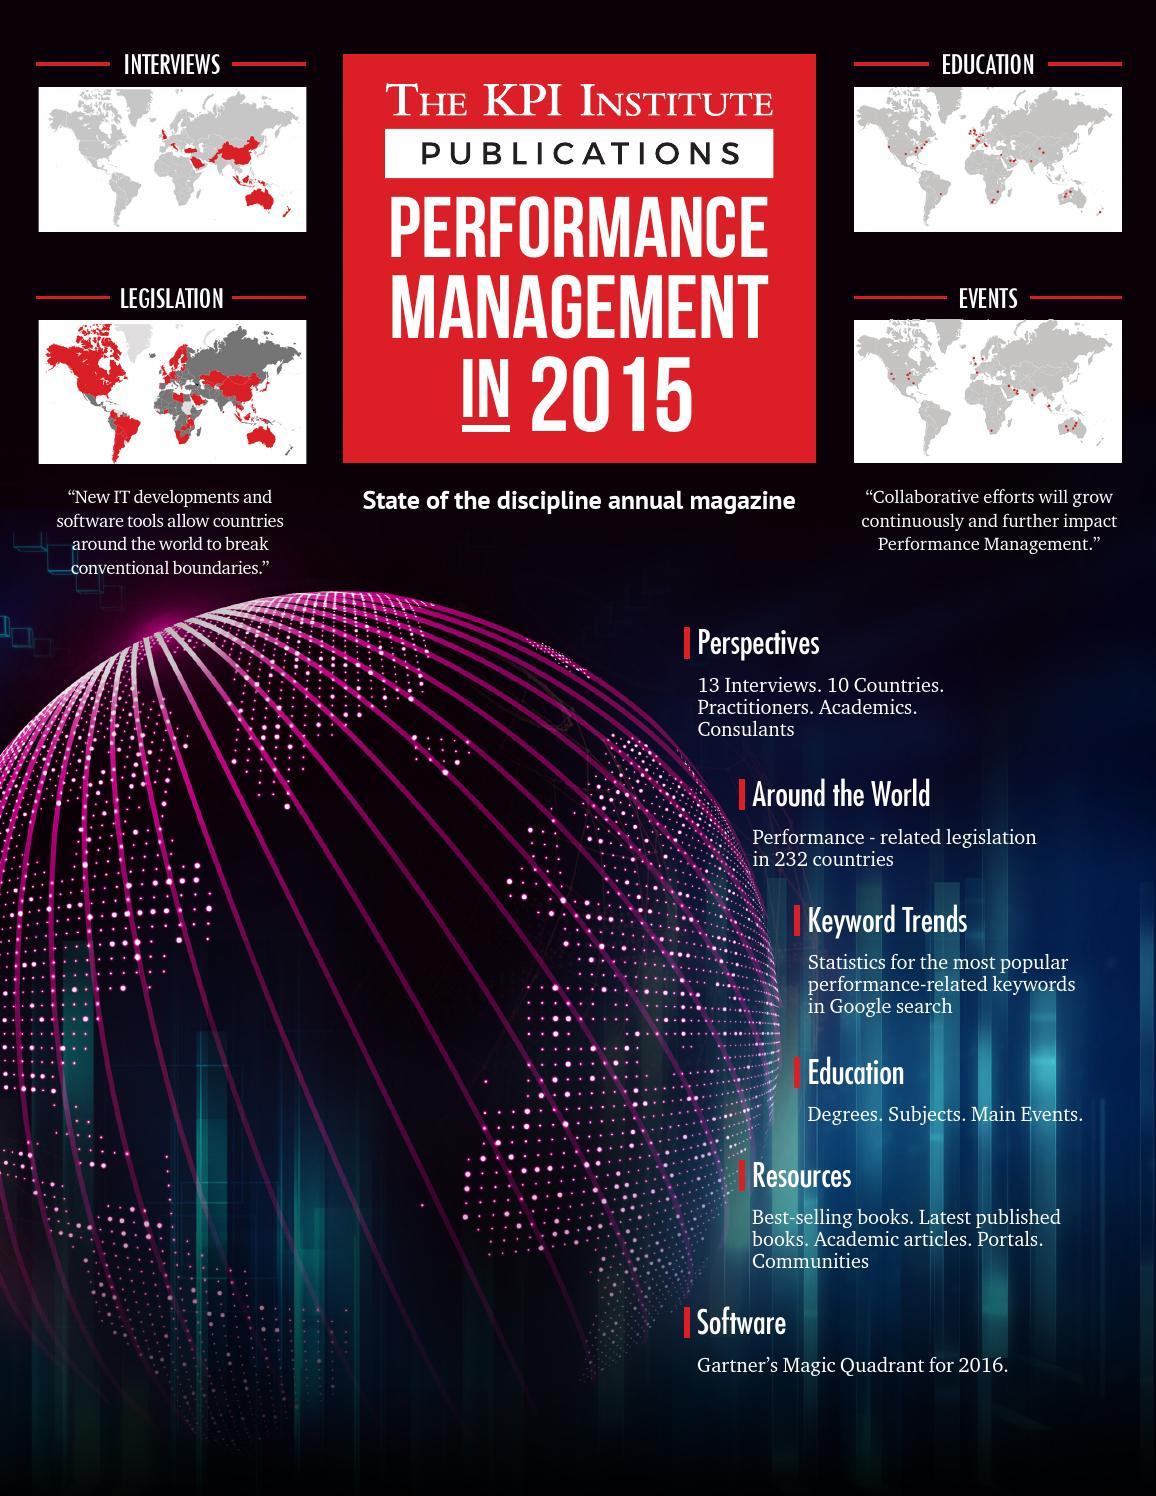 Gerenciamento de projetos 8 edio by ricardo viana vargas issuu performance management 2015 global edition fandeluxe Images